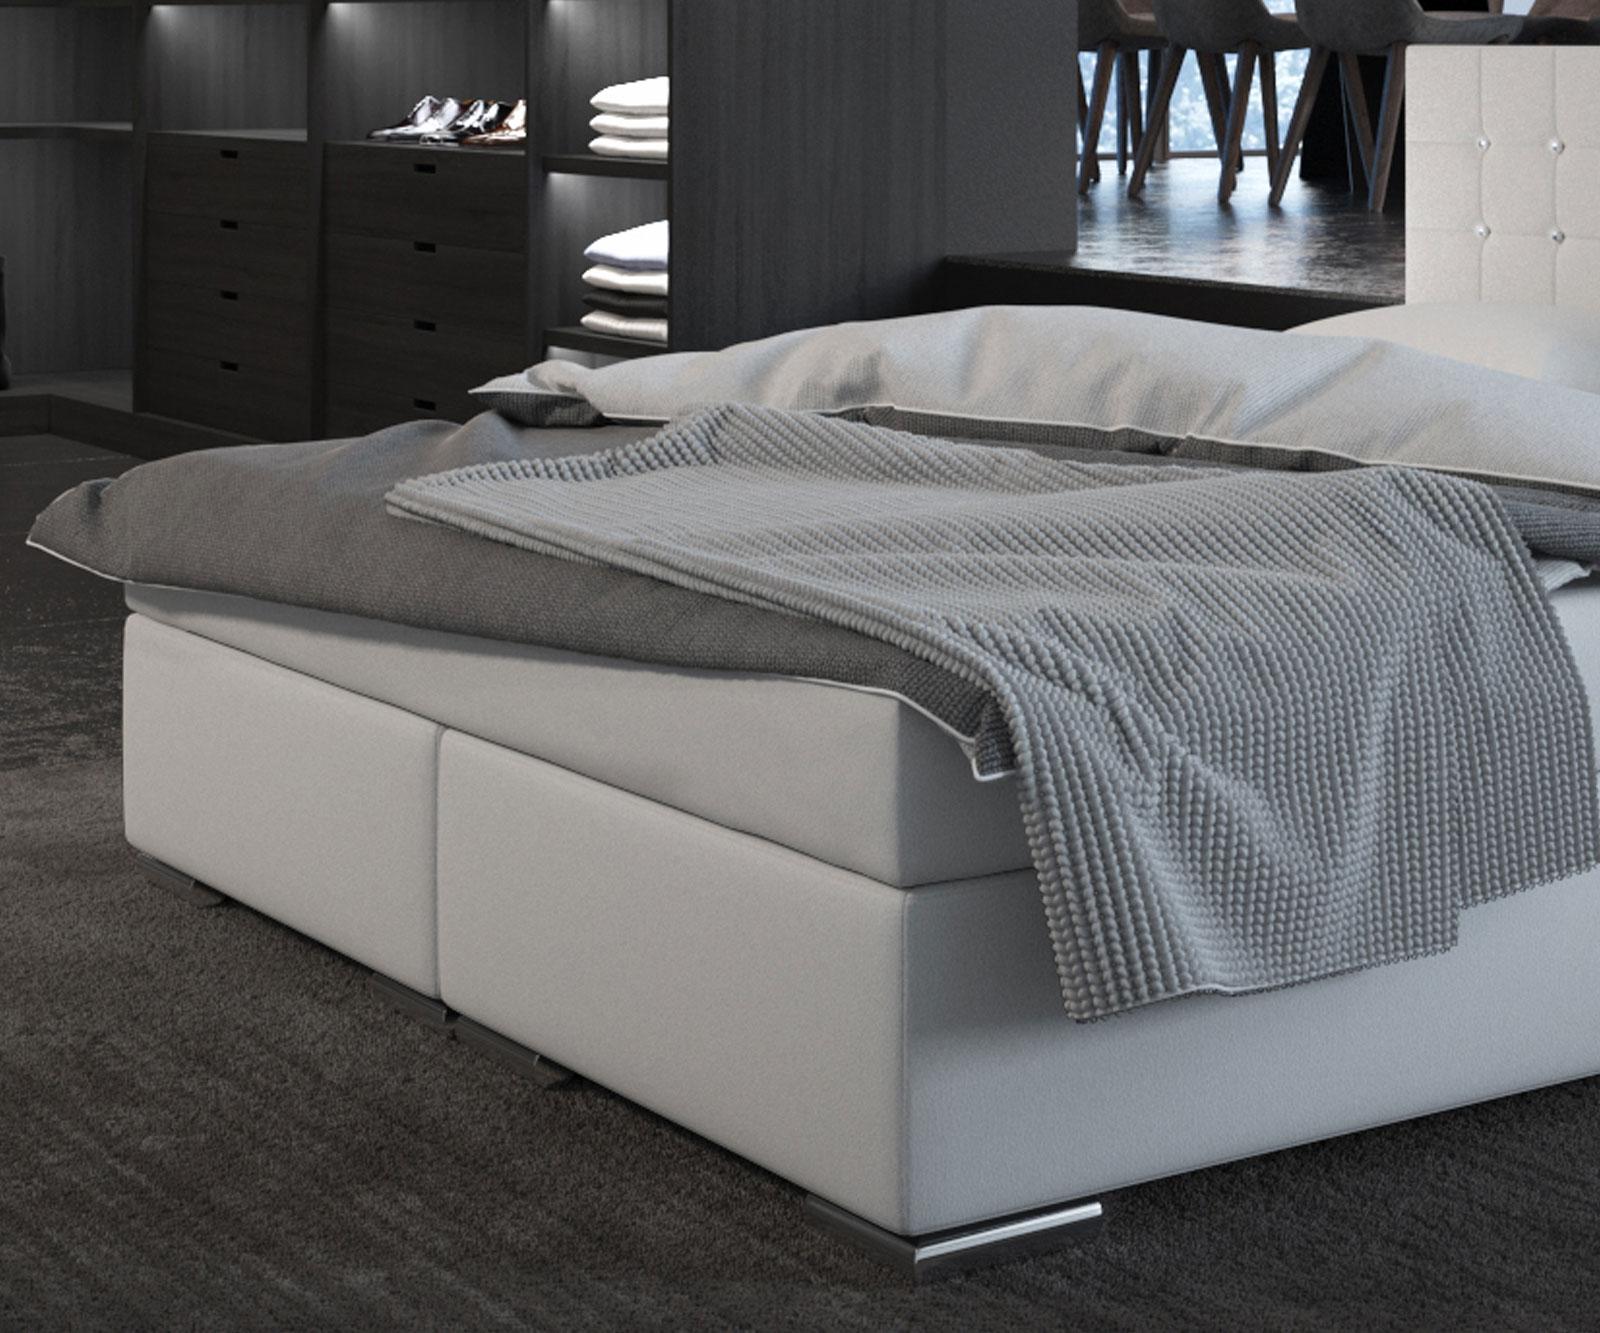 sam boxspringbett princess wei 180 x 200 cm doppelbett demn chst. Black Bedroom Furniture Sets. Home Design Ideas